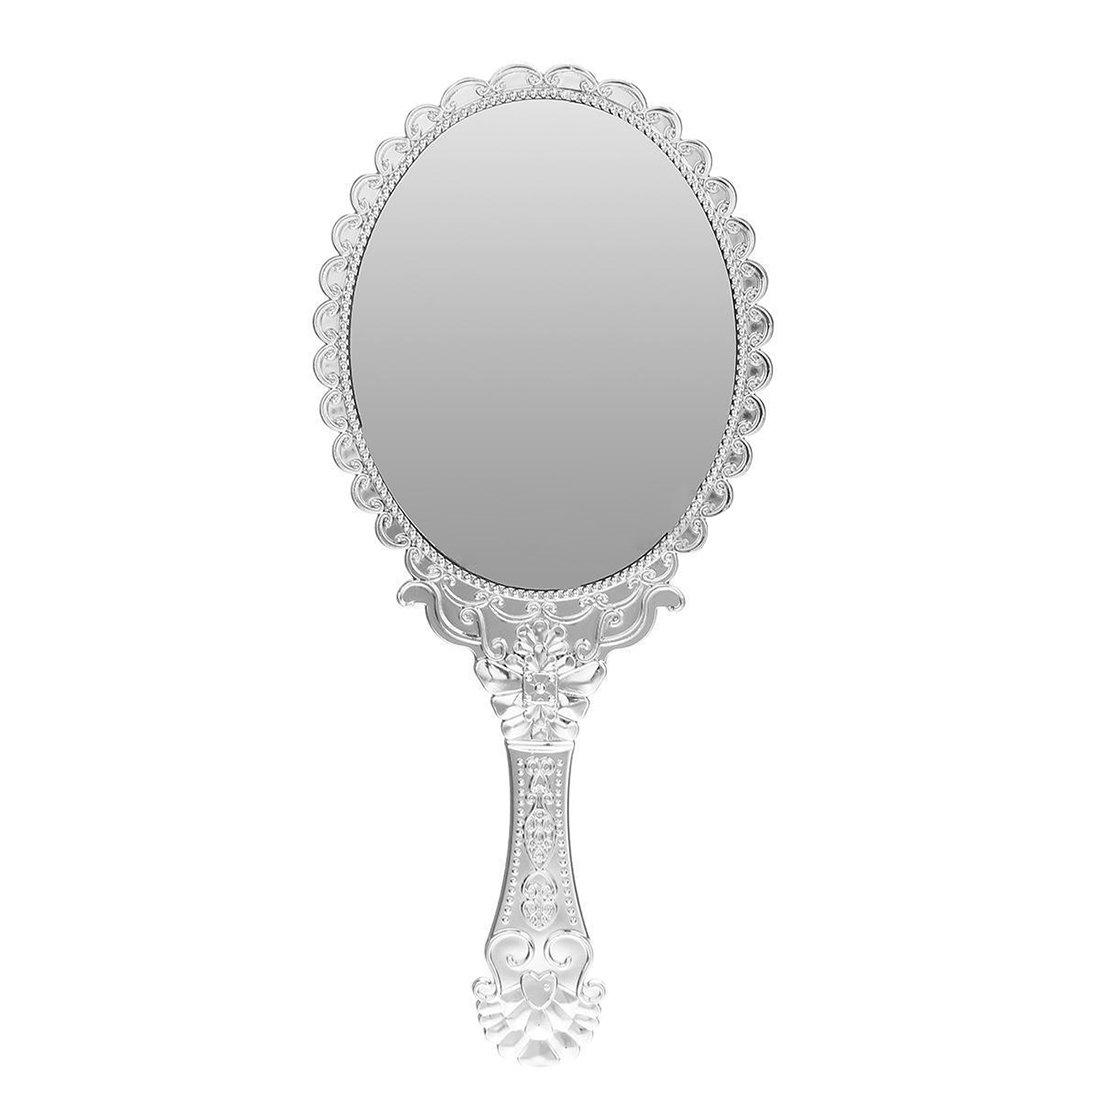 SODIAL(R) Ladies Vintage Repousse Floral Hand Held Oval Mirror Makeup Dresser